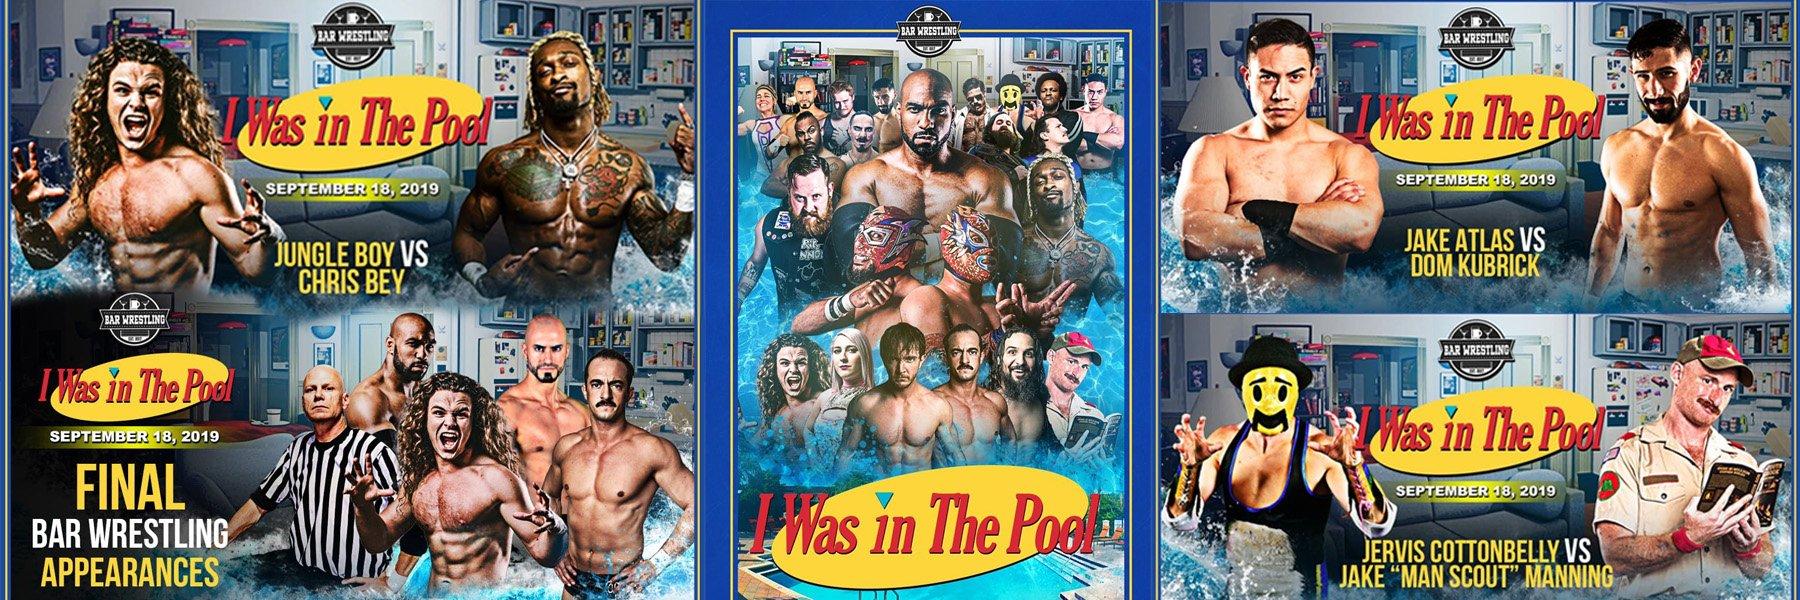 Bar Wrestling 44: I Was in the Pool (Jungle Boy vs Chris Bey, Jake Atlas)